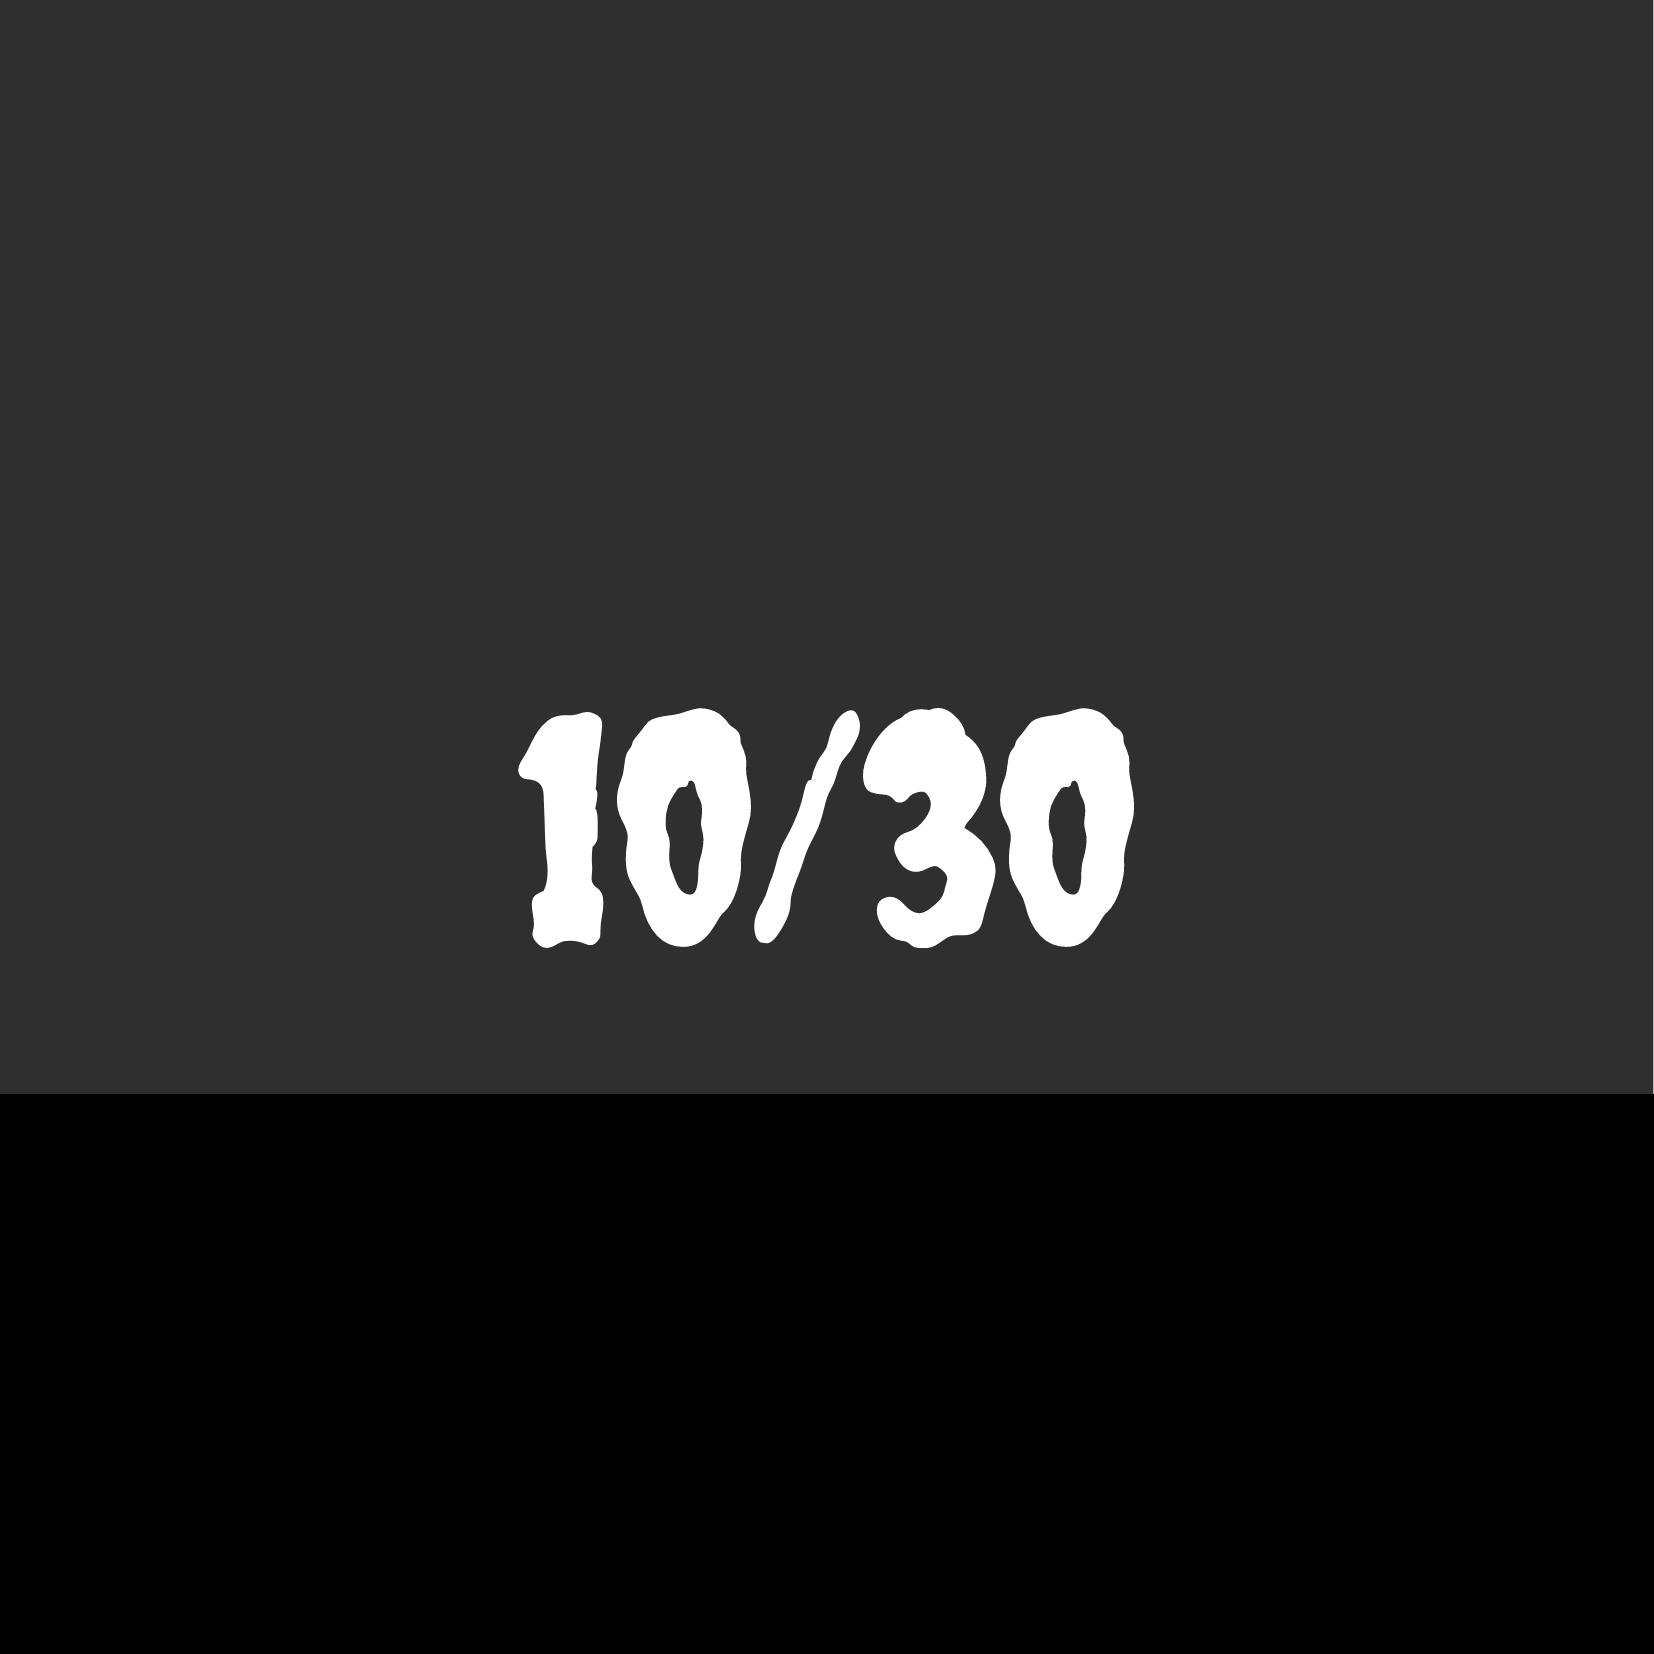 Halloween Event - 10/30